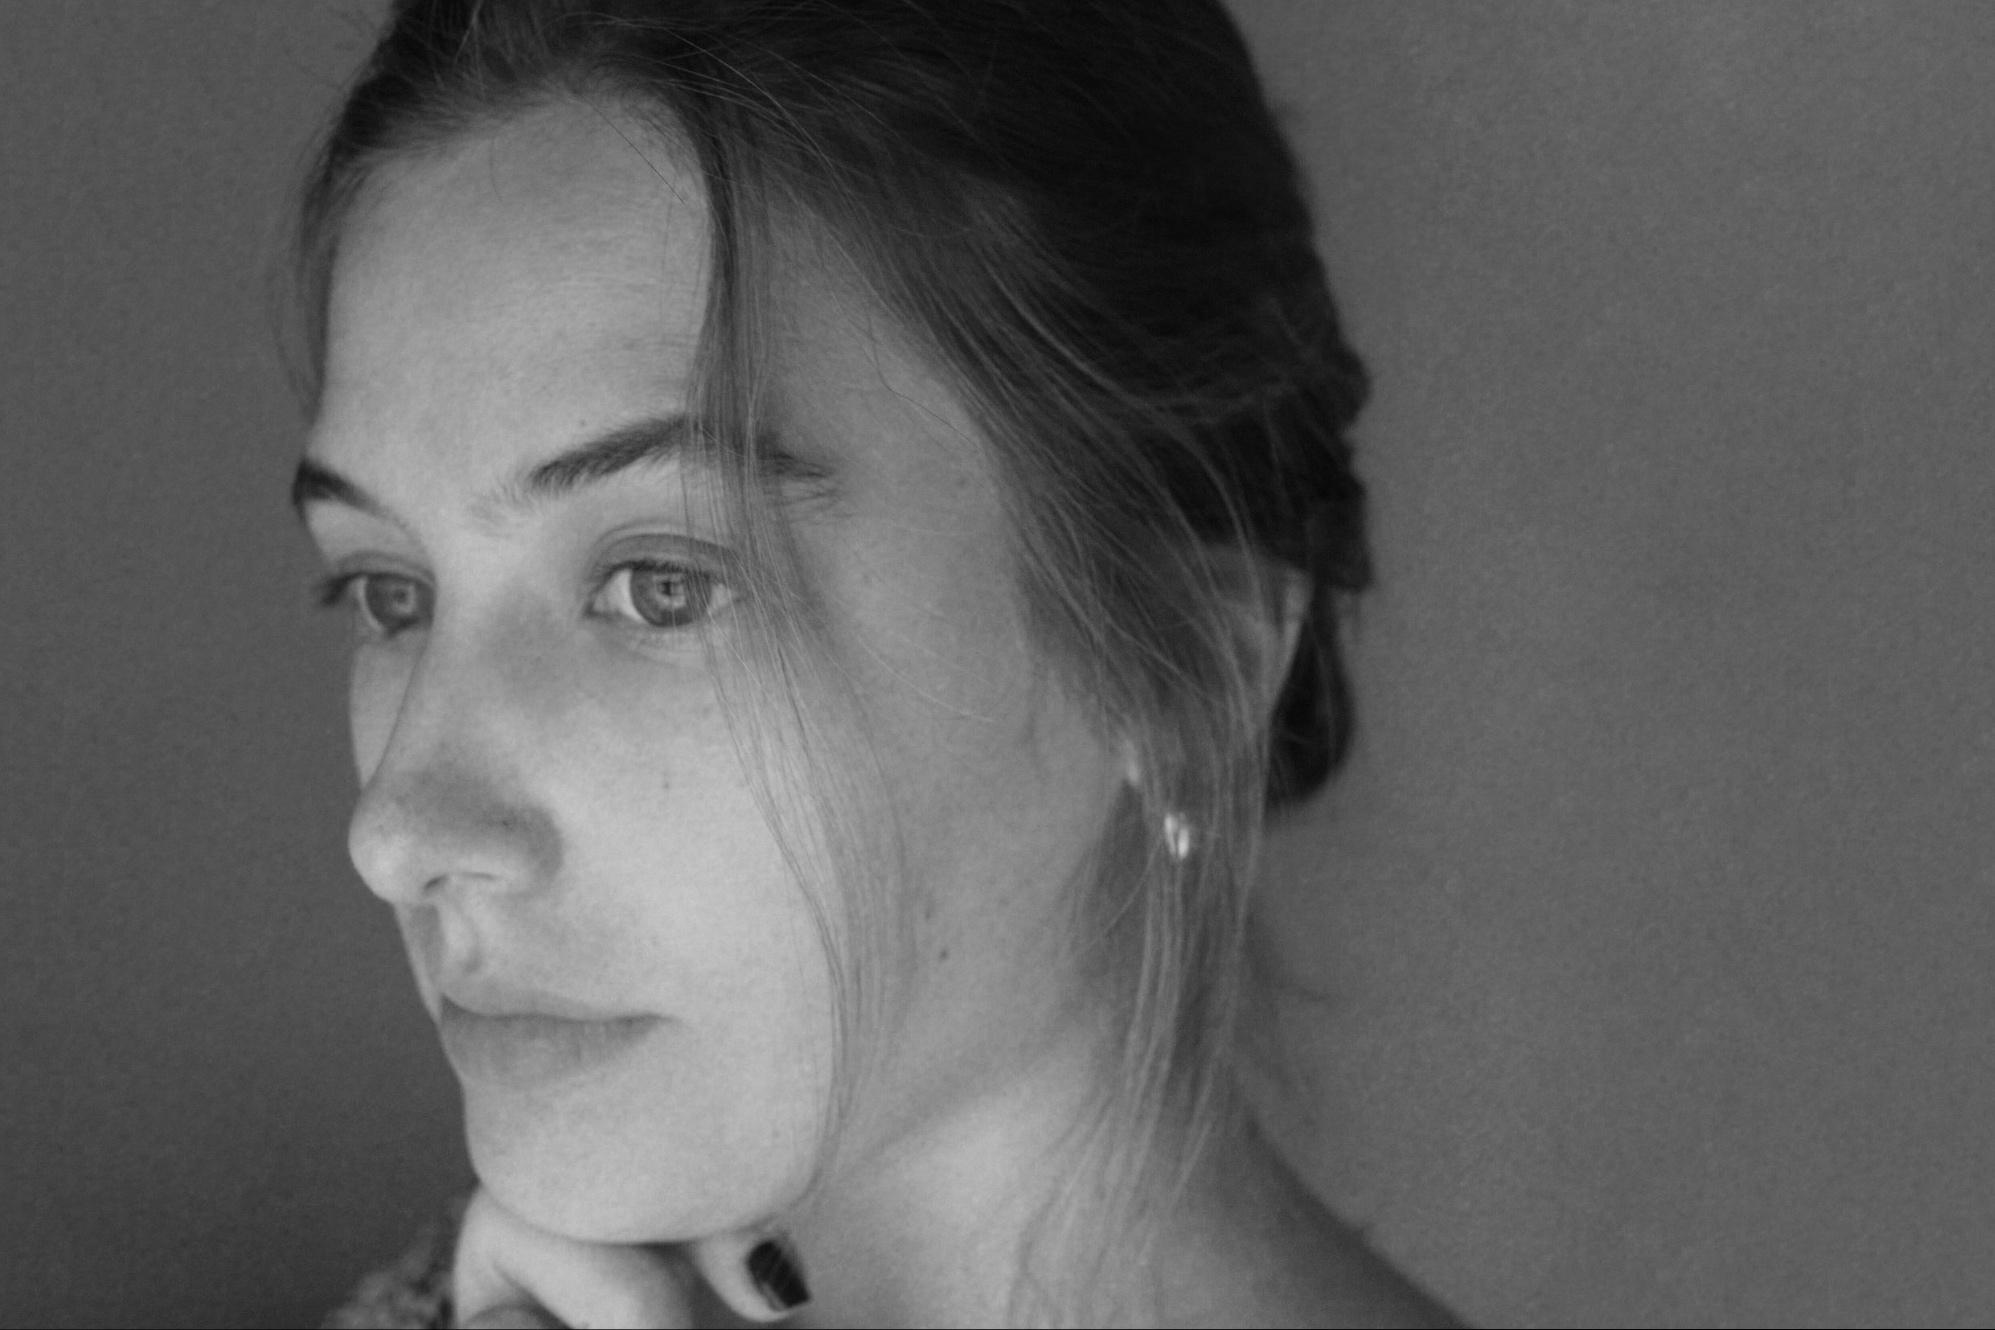 SUBMISSION / Founder & Editor Tiana Petrullo